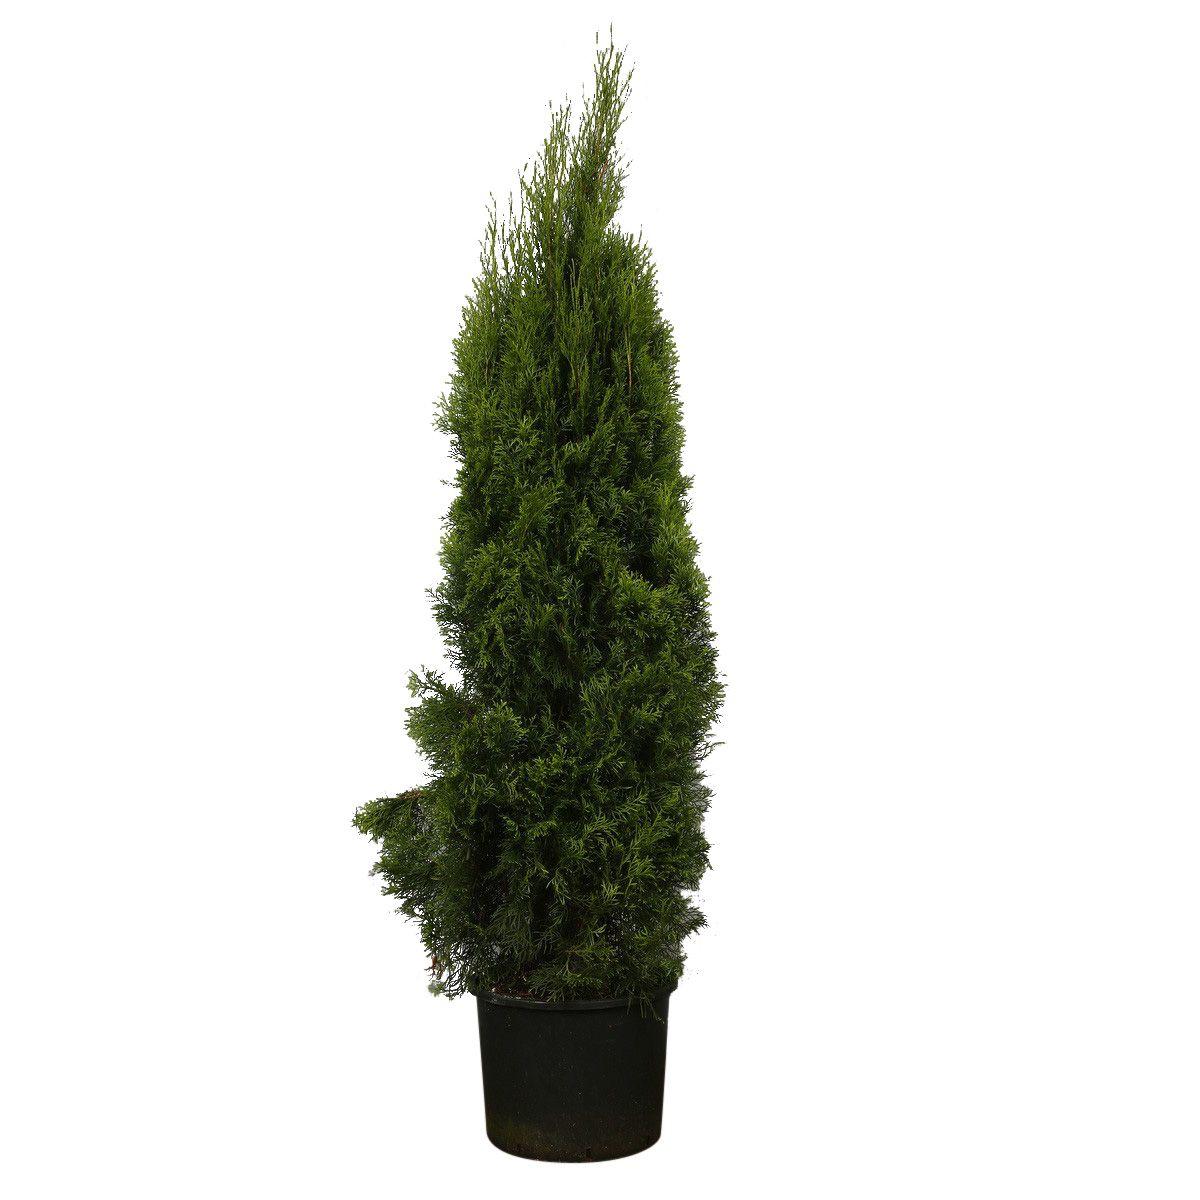 Westerse Levensboom 'Smaragd' Pot 160-180 cm Extra kwaliteit